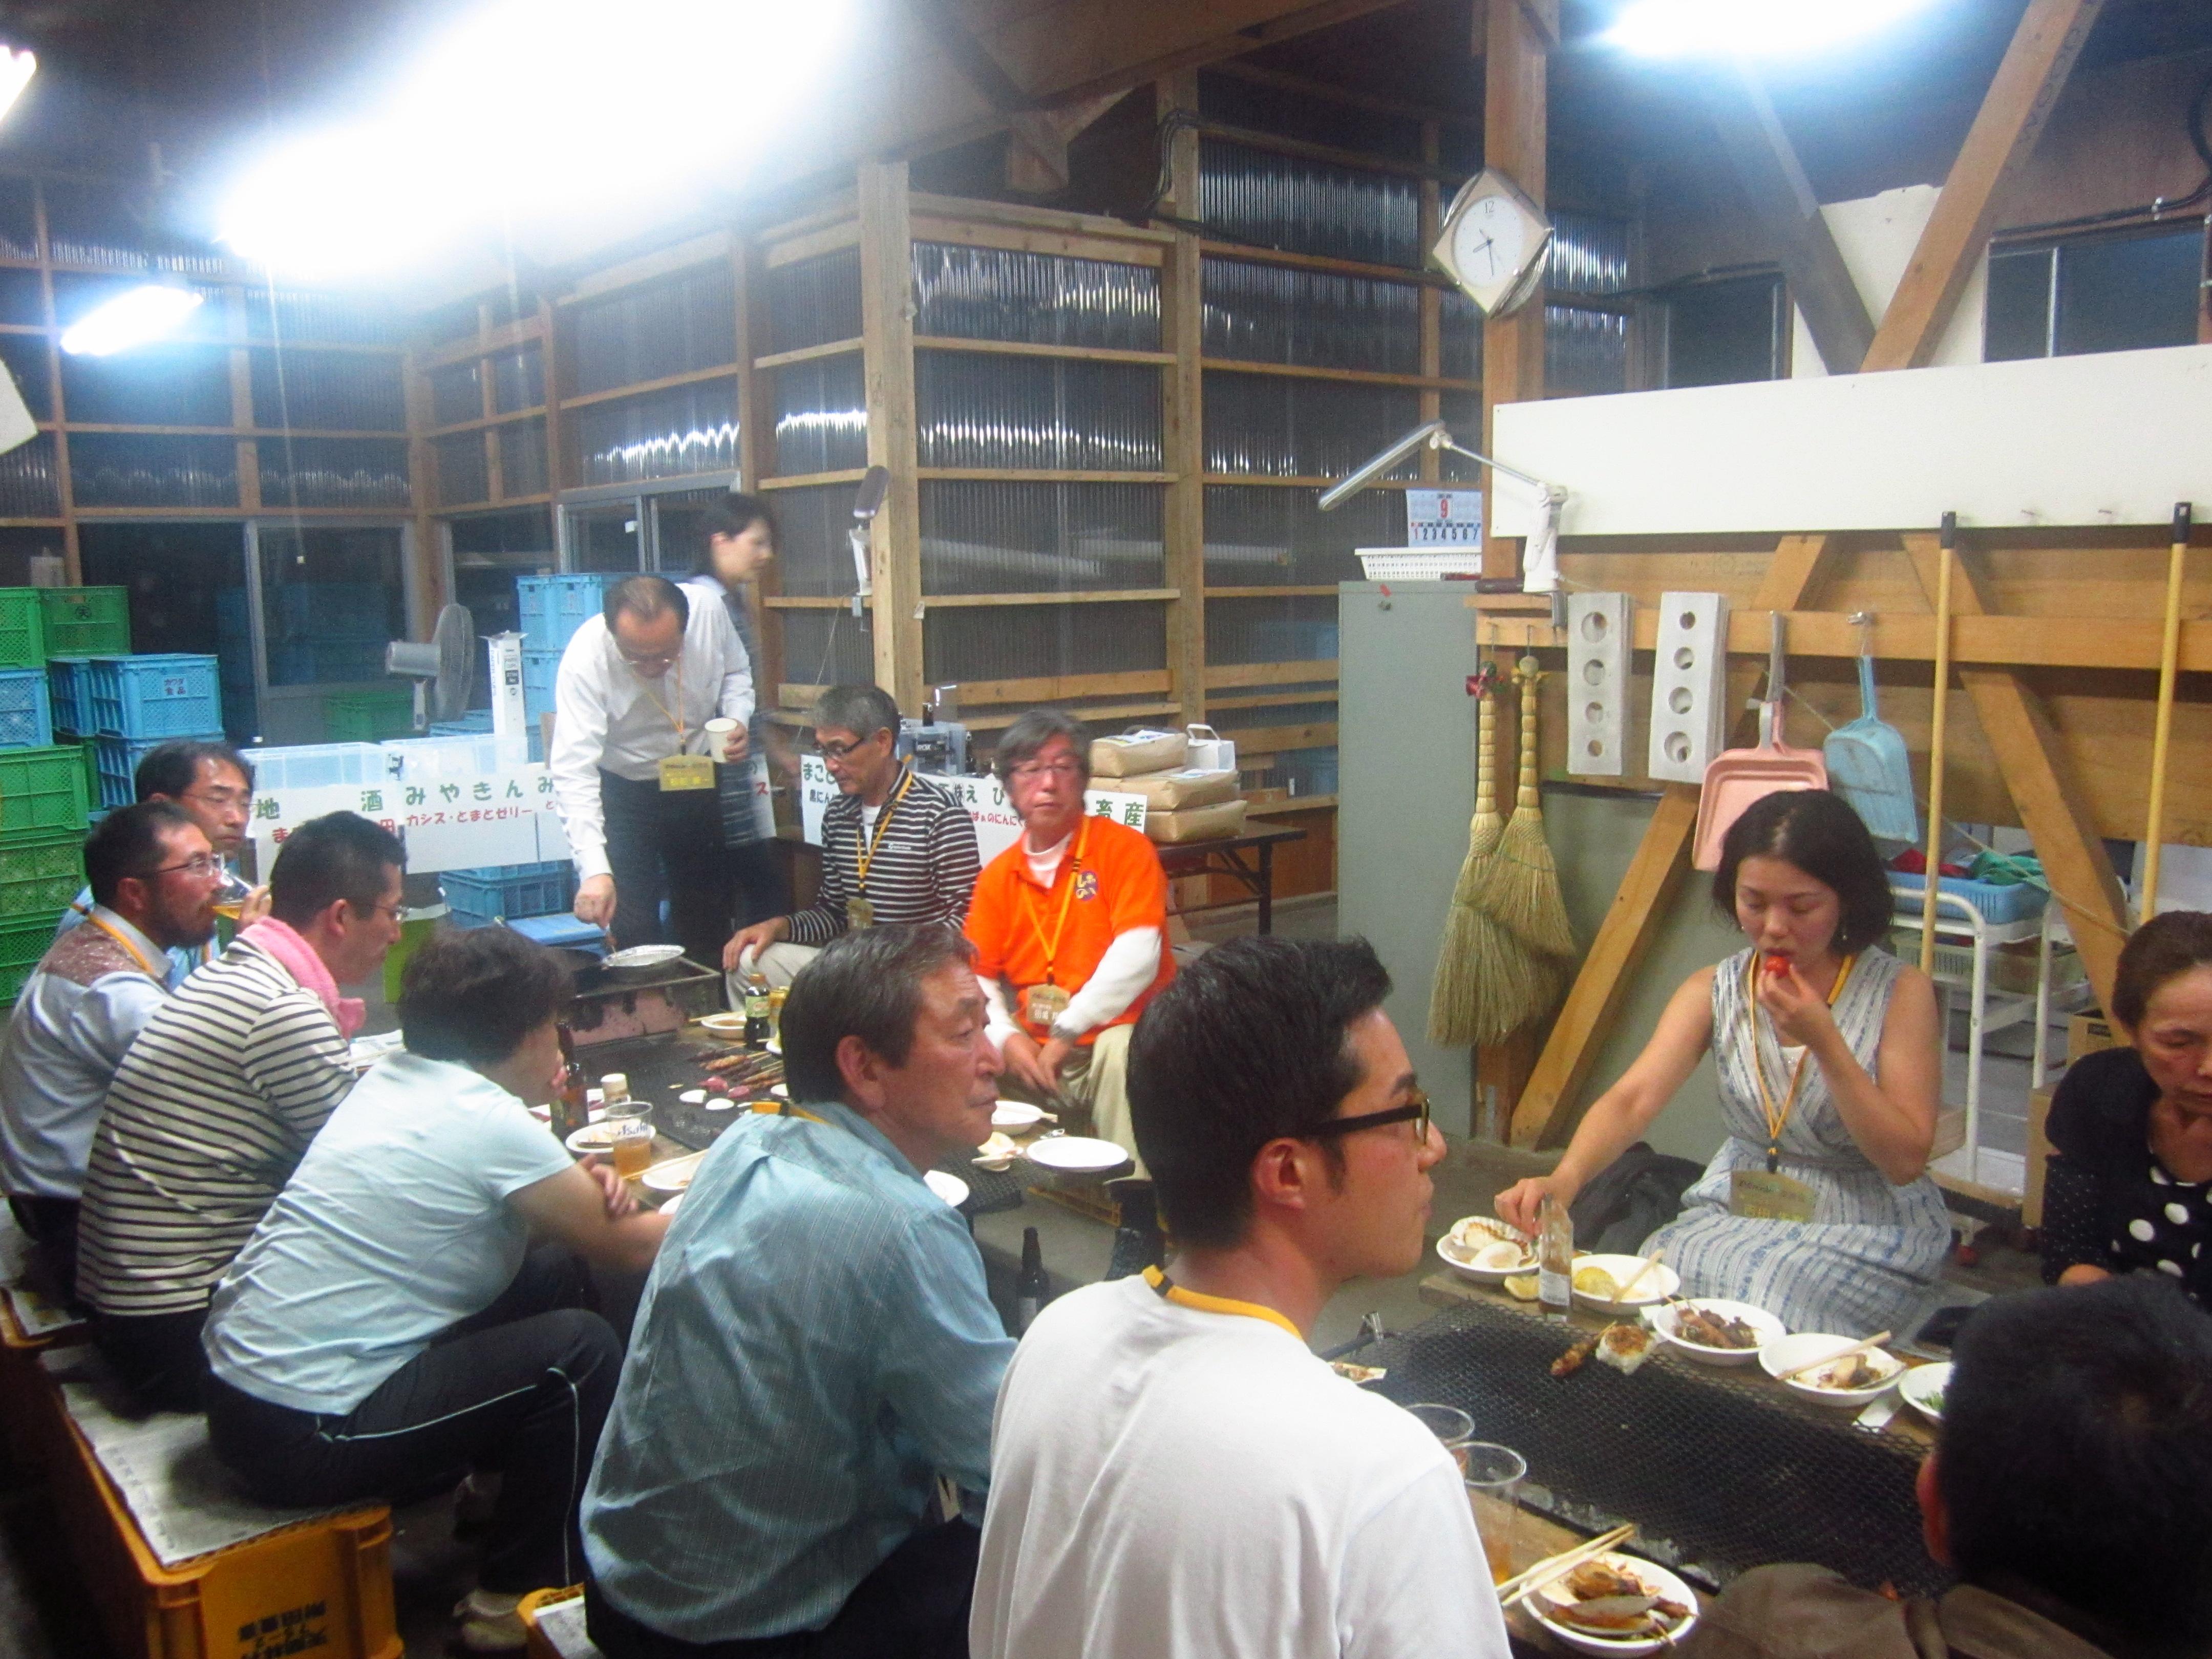 IMG 4370 - 麻布十番納涼祭り25,26日(七戸町出店)